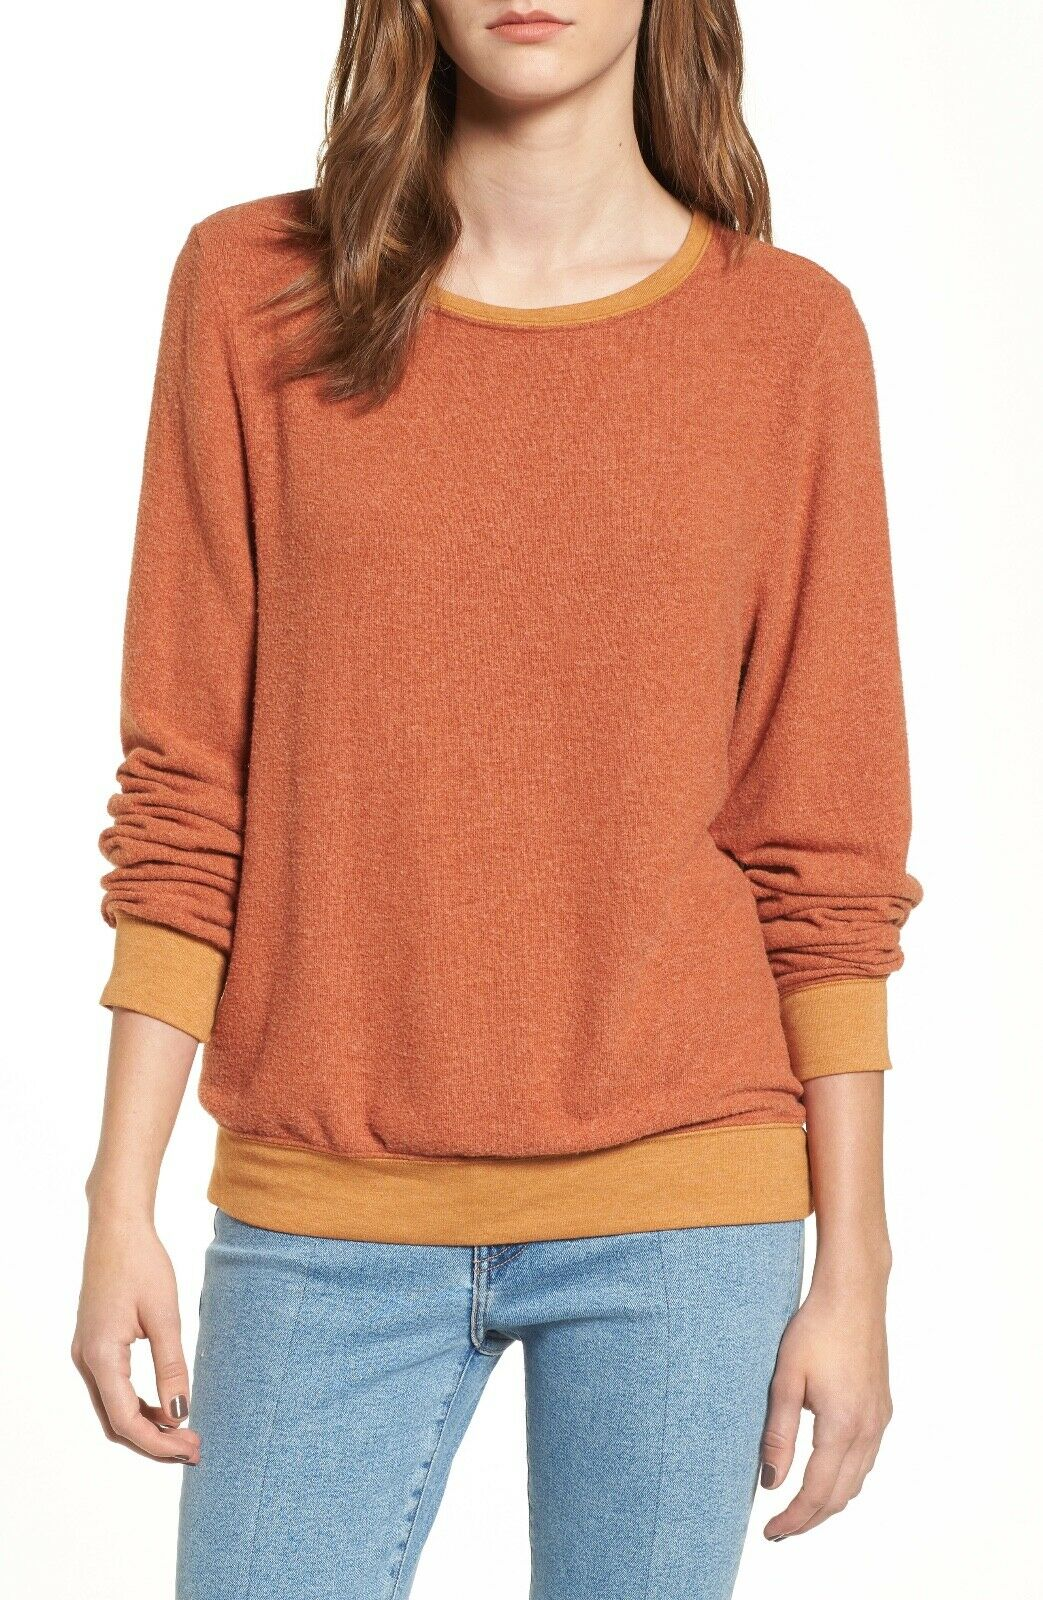 Wildfox Couture Baggy Beach Jumper Sweatshirt. color  Burnt orange. Sz  S